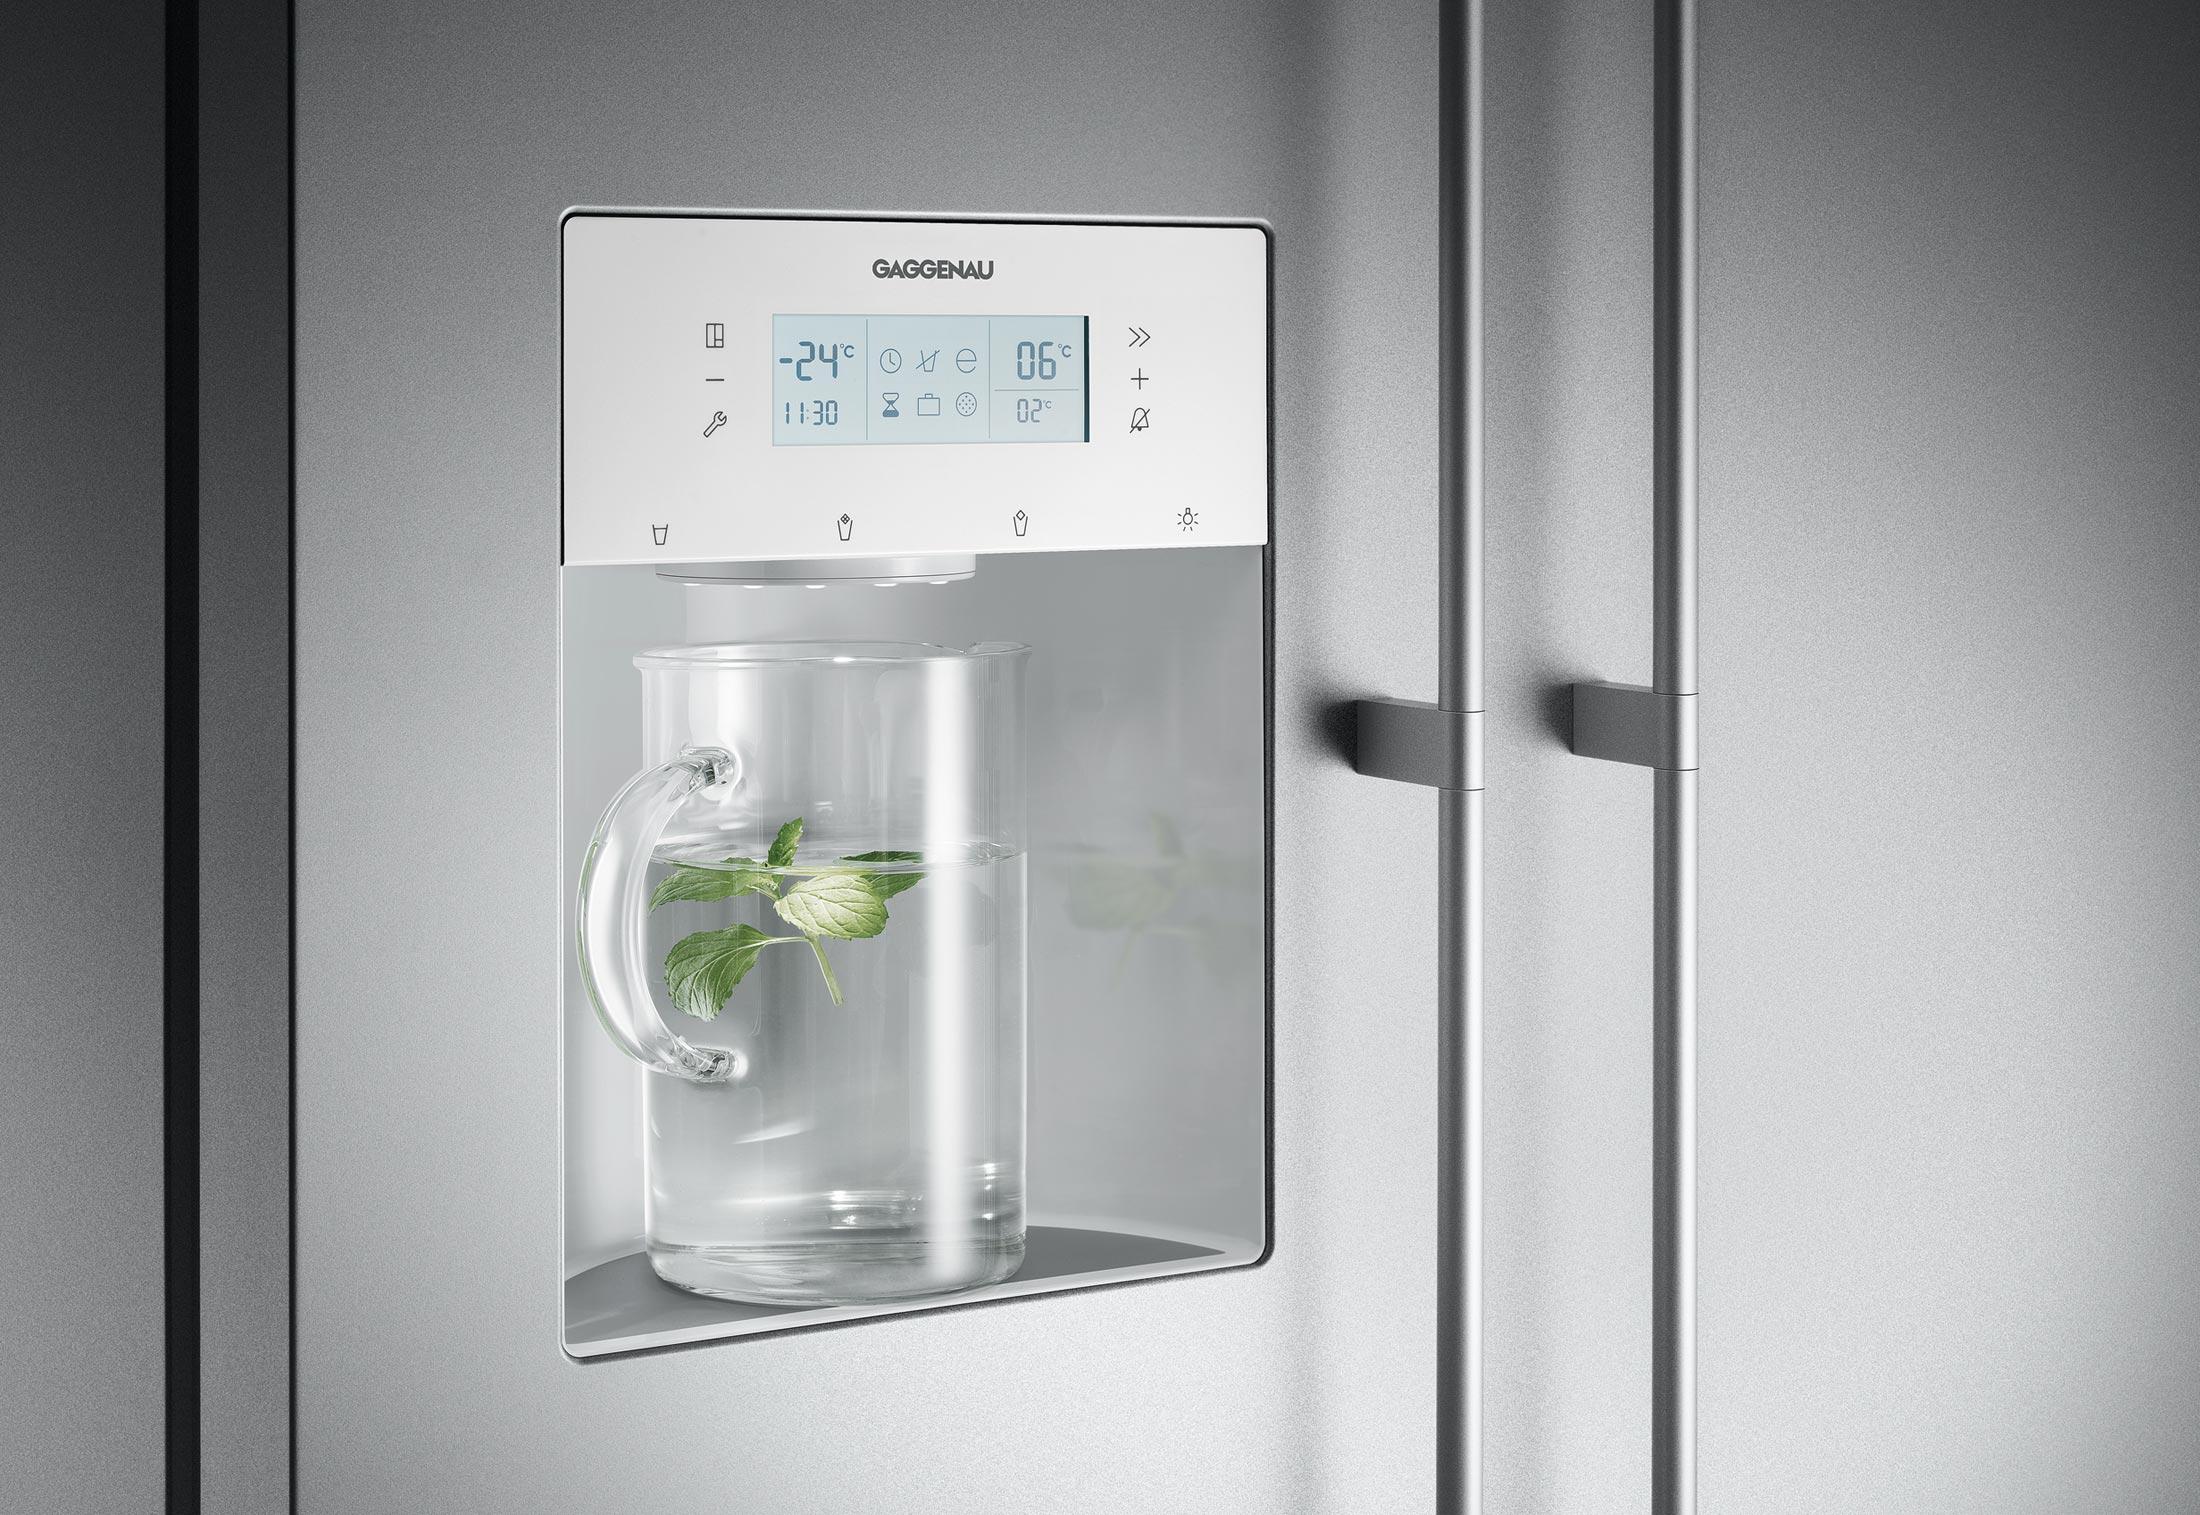 gaggenau exclusive partner for de padova home appliances world